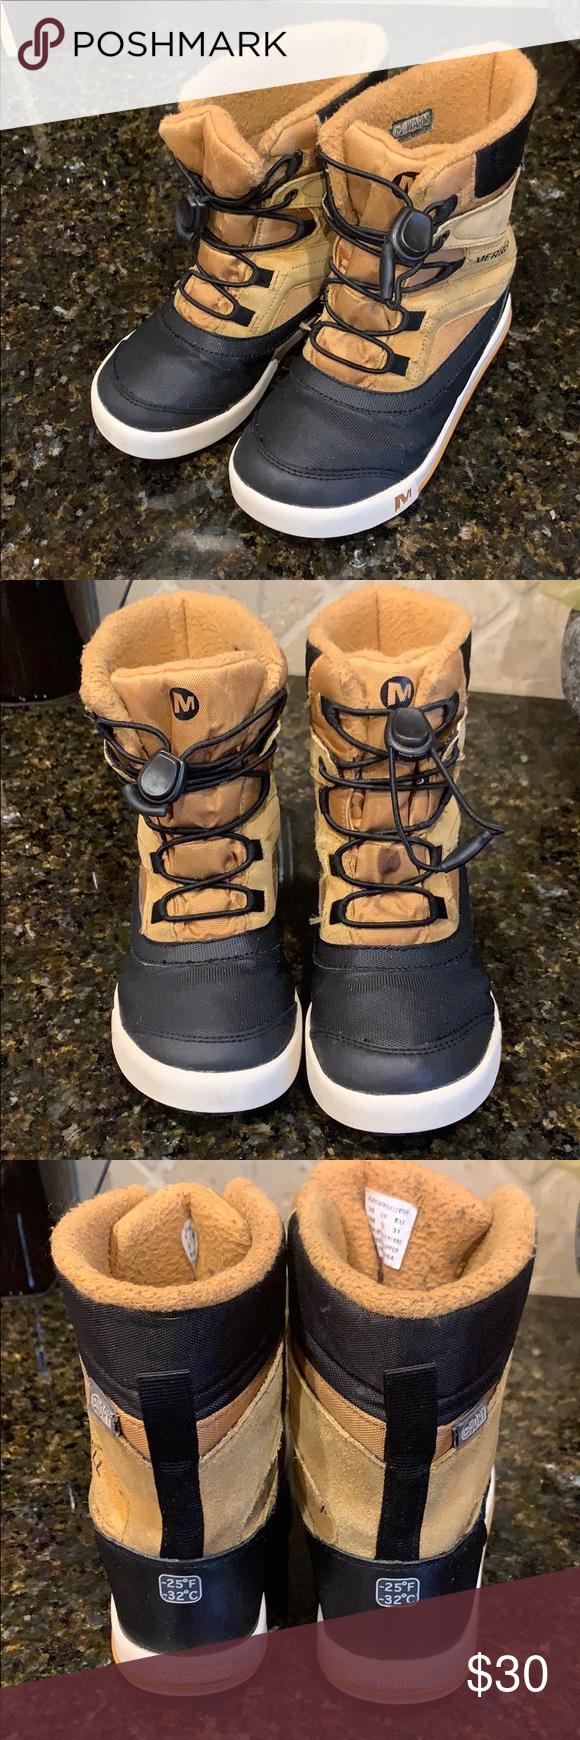 Merrell Boys Snow Winter Boots | Boots